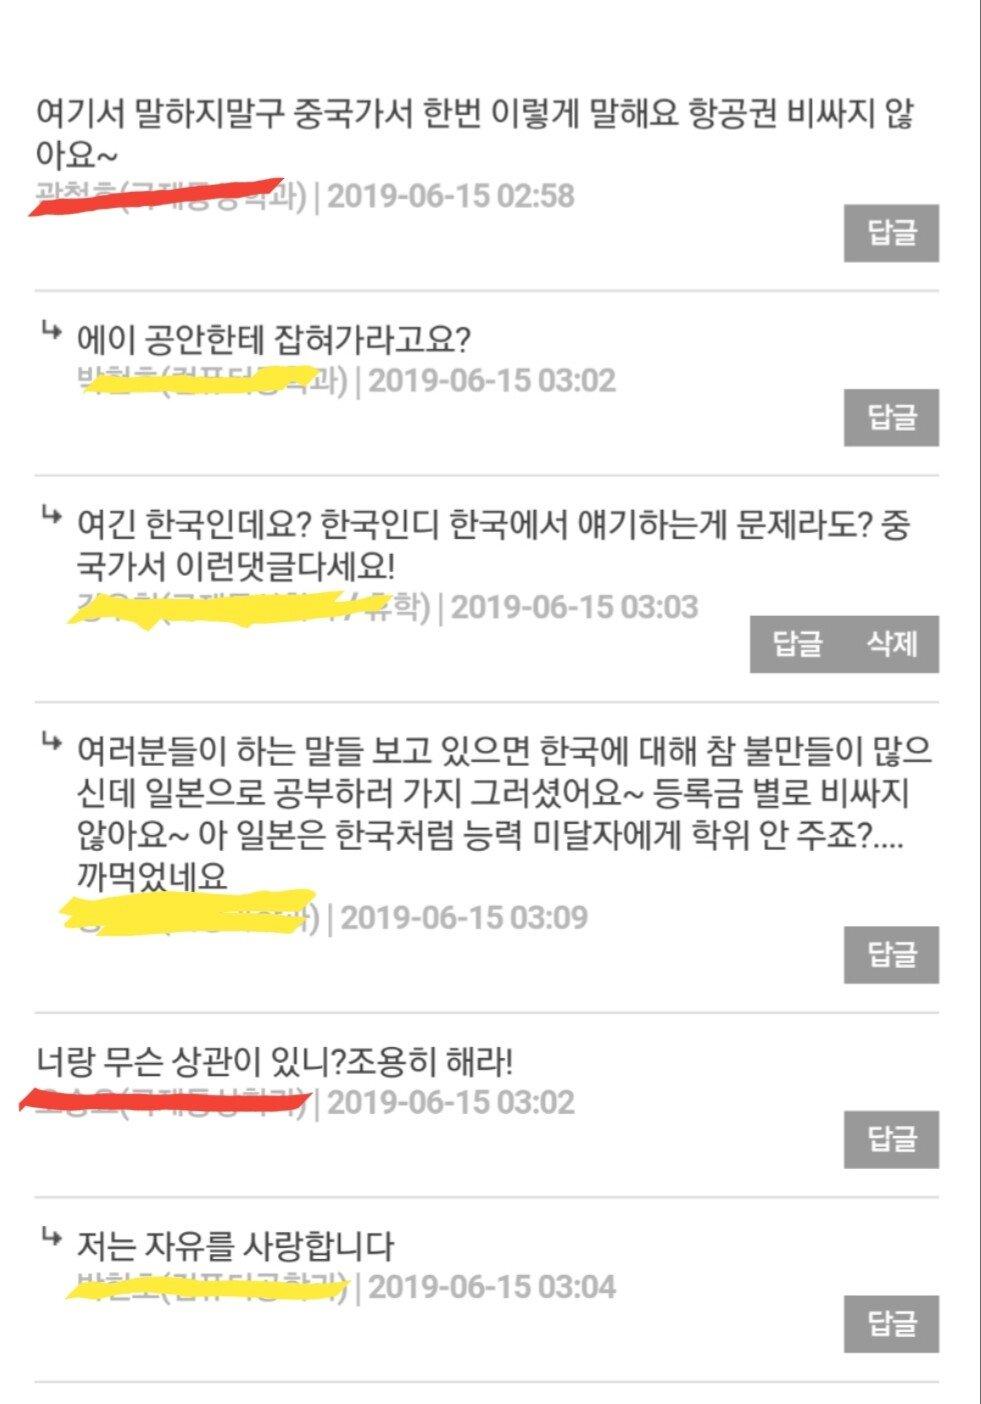 20190615_035259.jpg +추가))우리 학교 중국인이랑 한국인 싸움났다